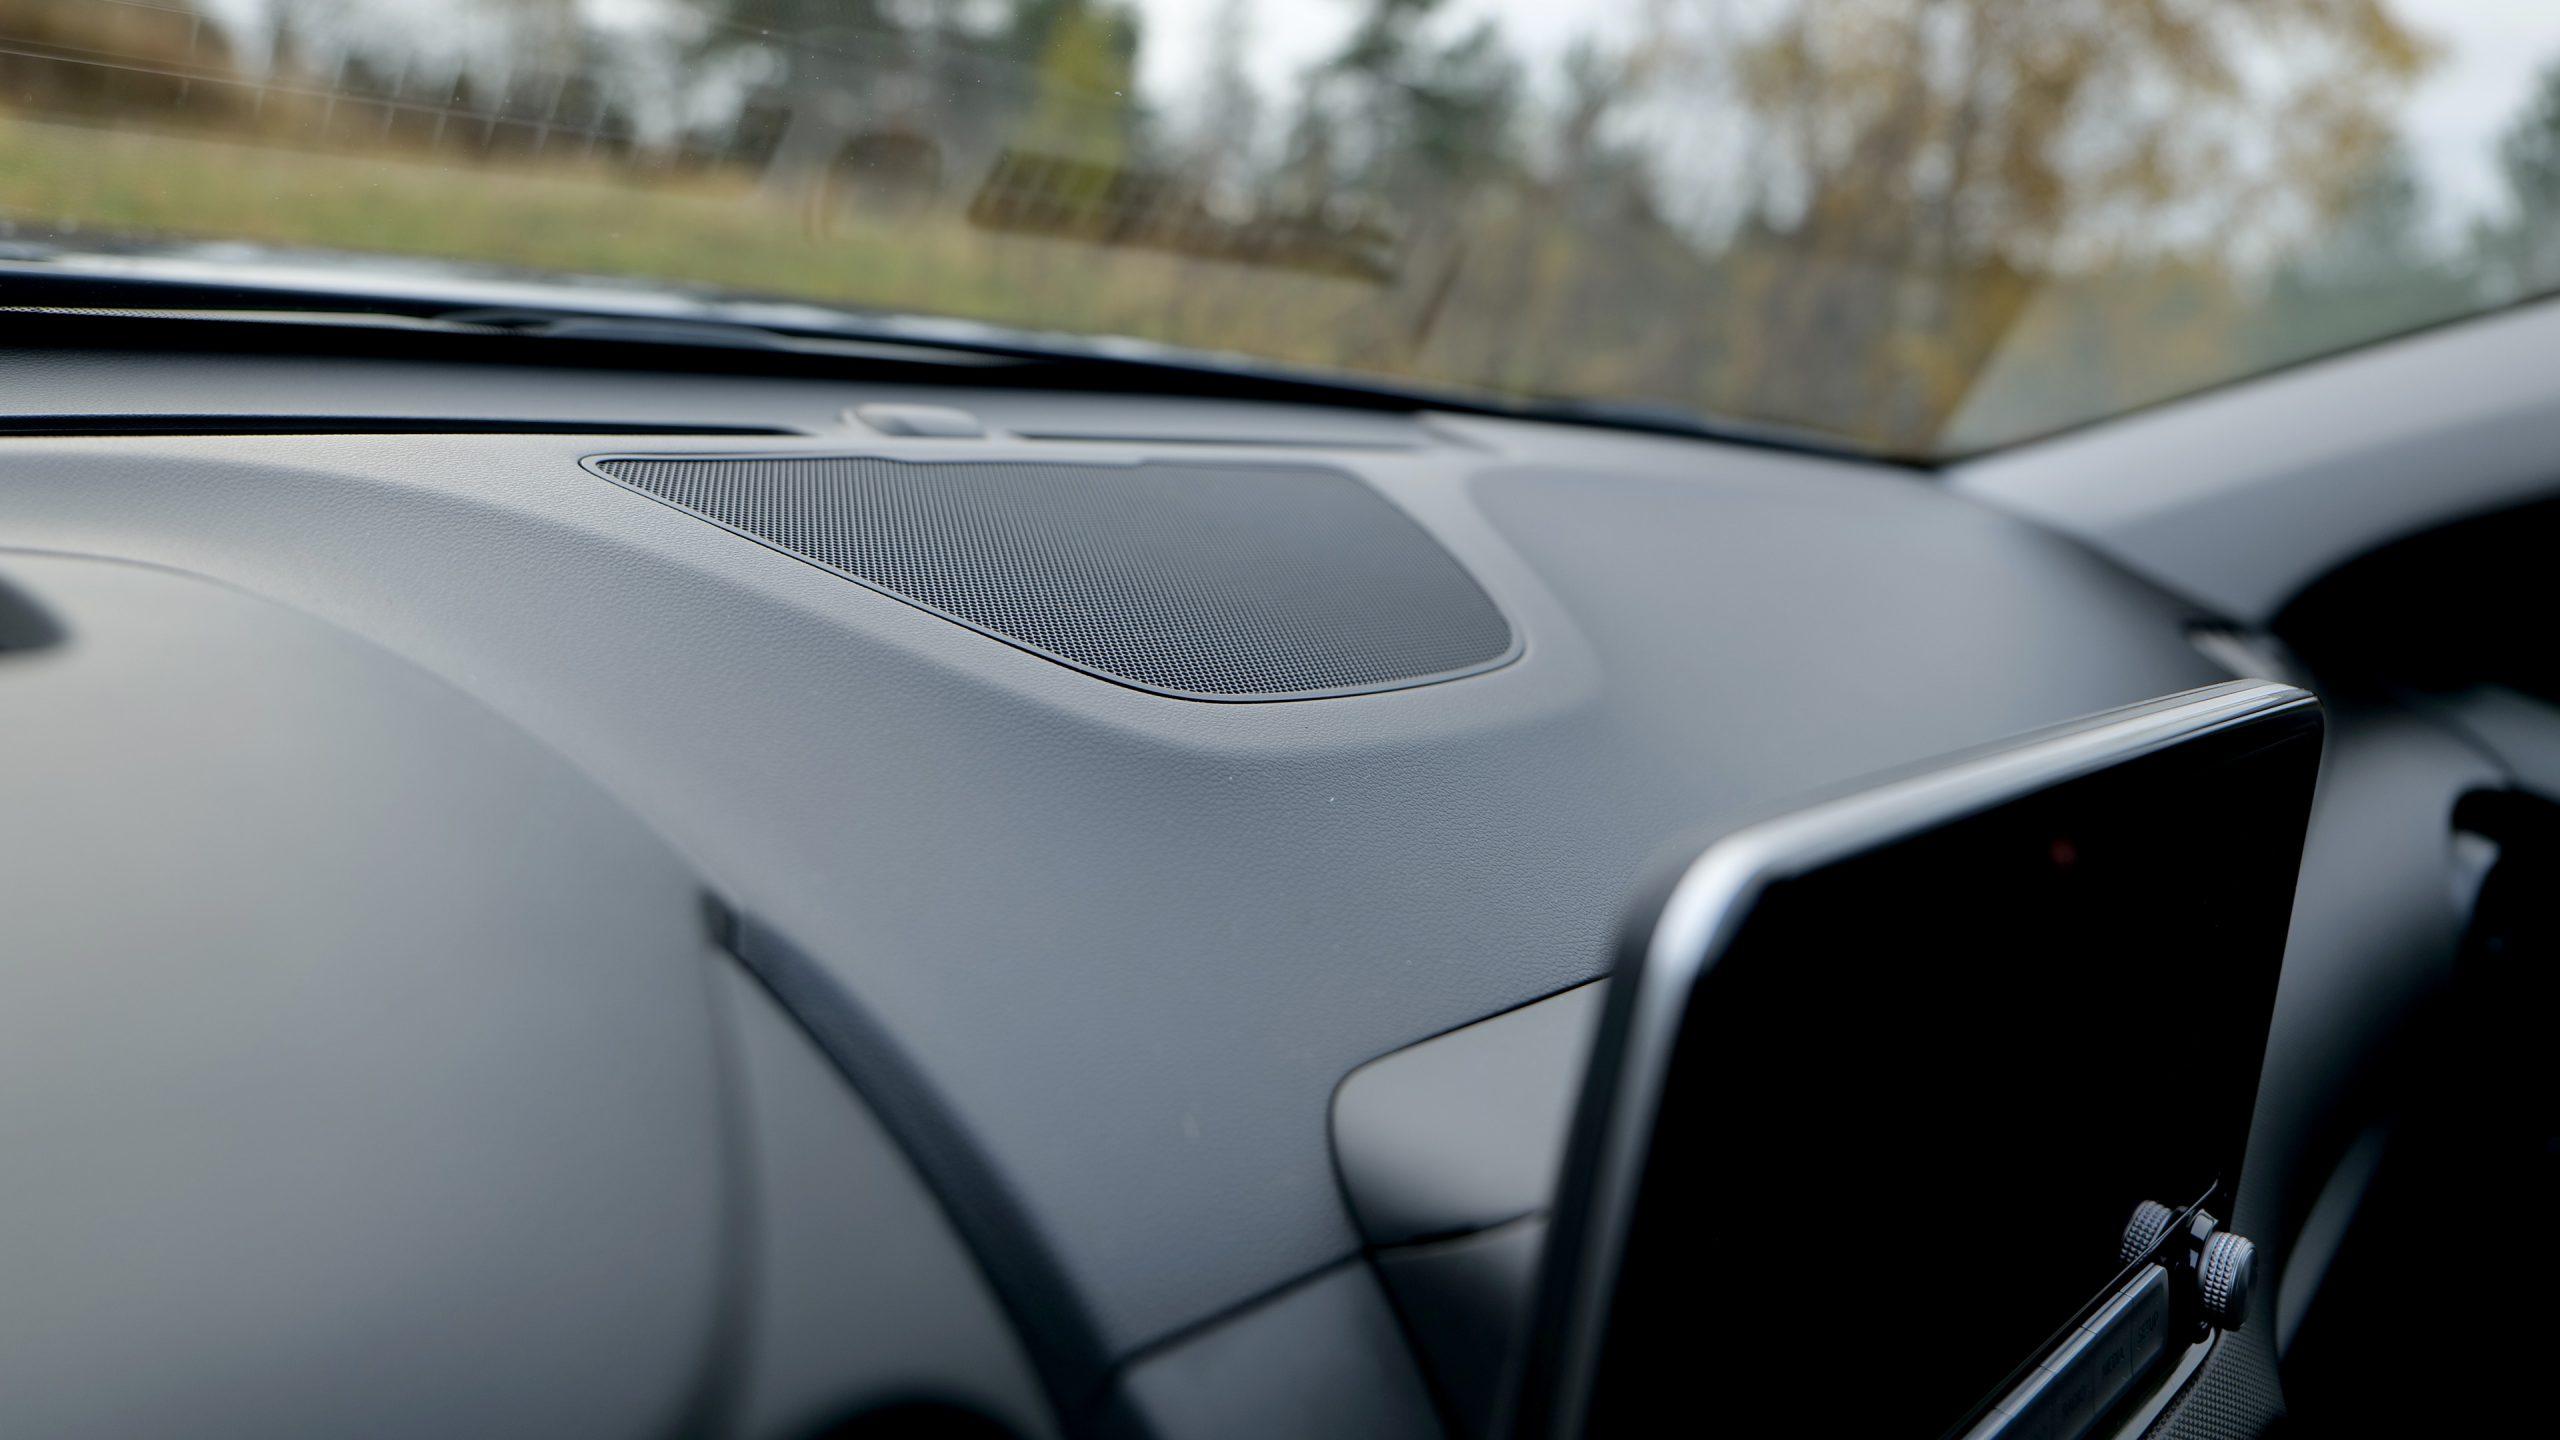 Hyundai Kona center speaker